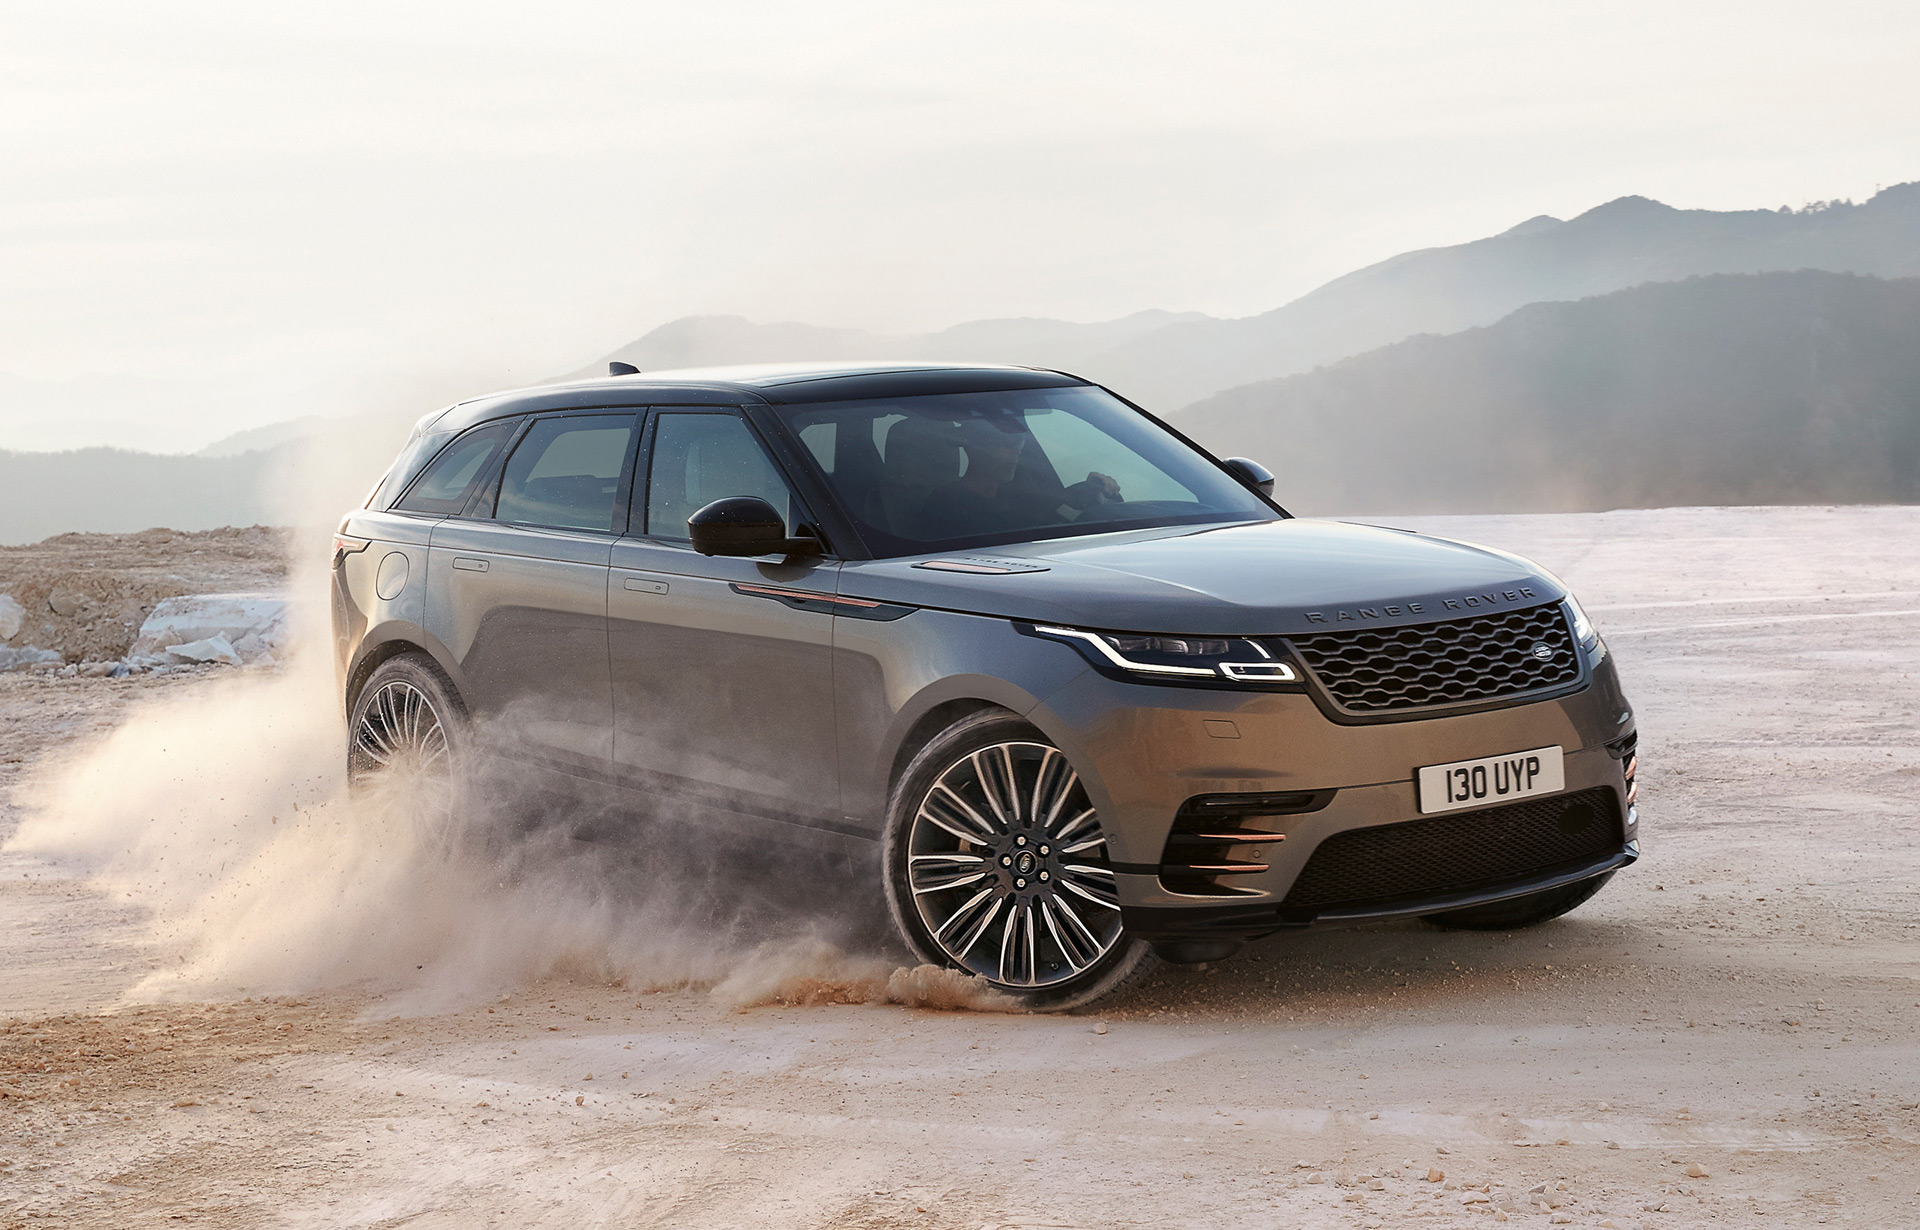 Does Range Rover Velar preview Jaguar I Pace electric car dash